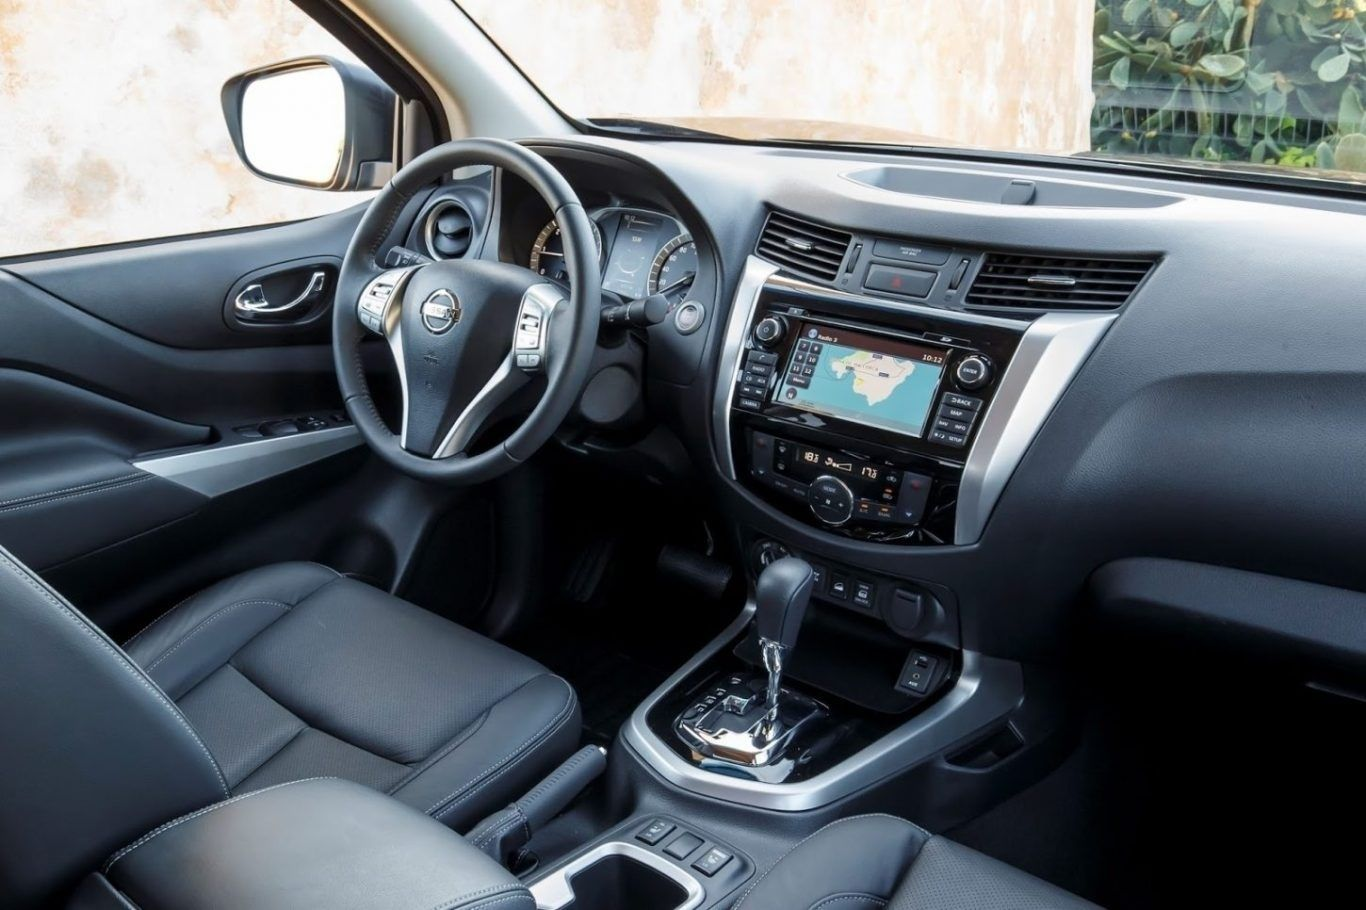 2020 Nissan Navara Review Price Design Engine Release Date Photos Pricing Nissan Navara New Nissan Navara Nissan